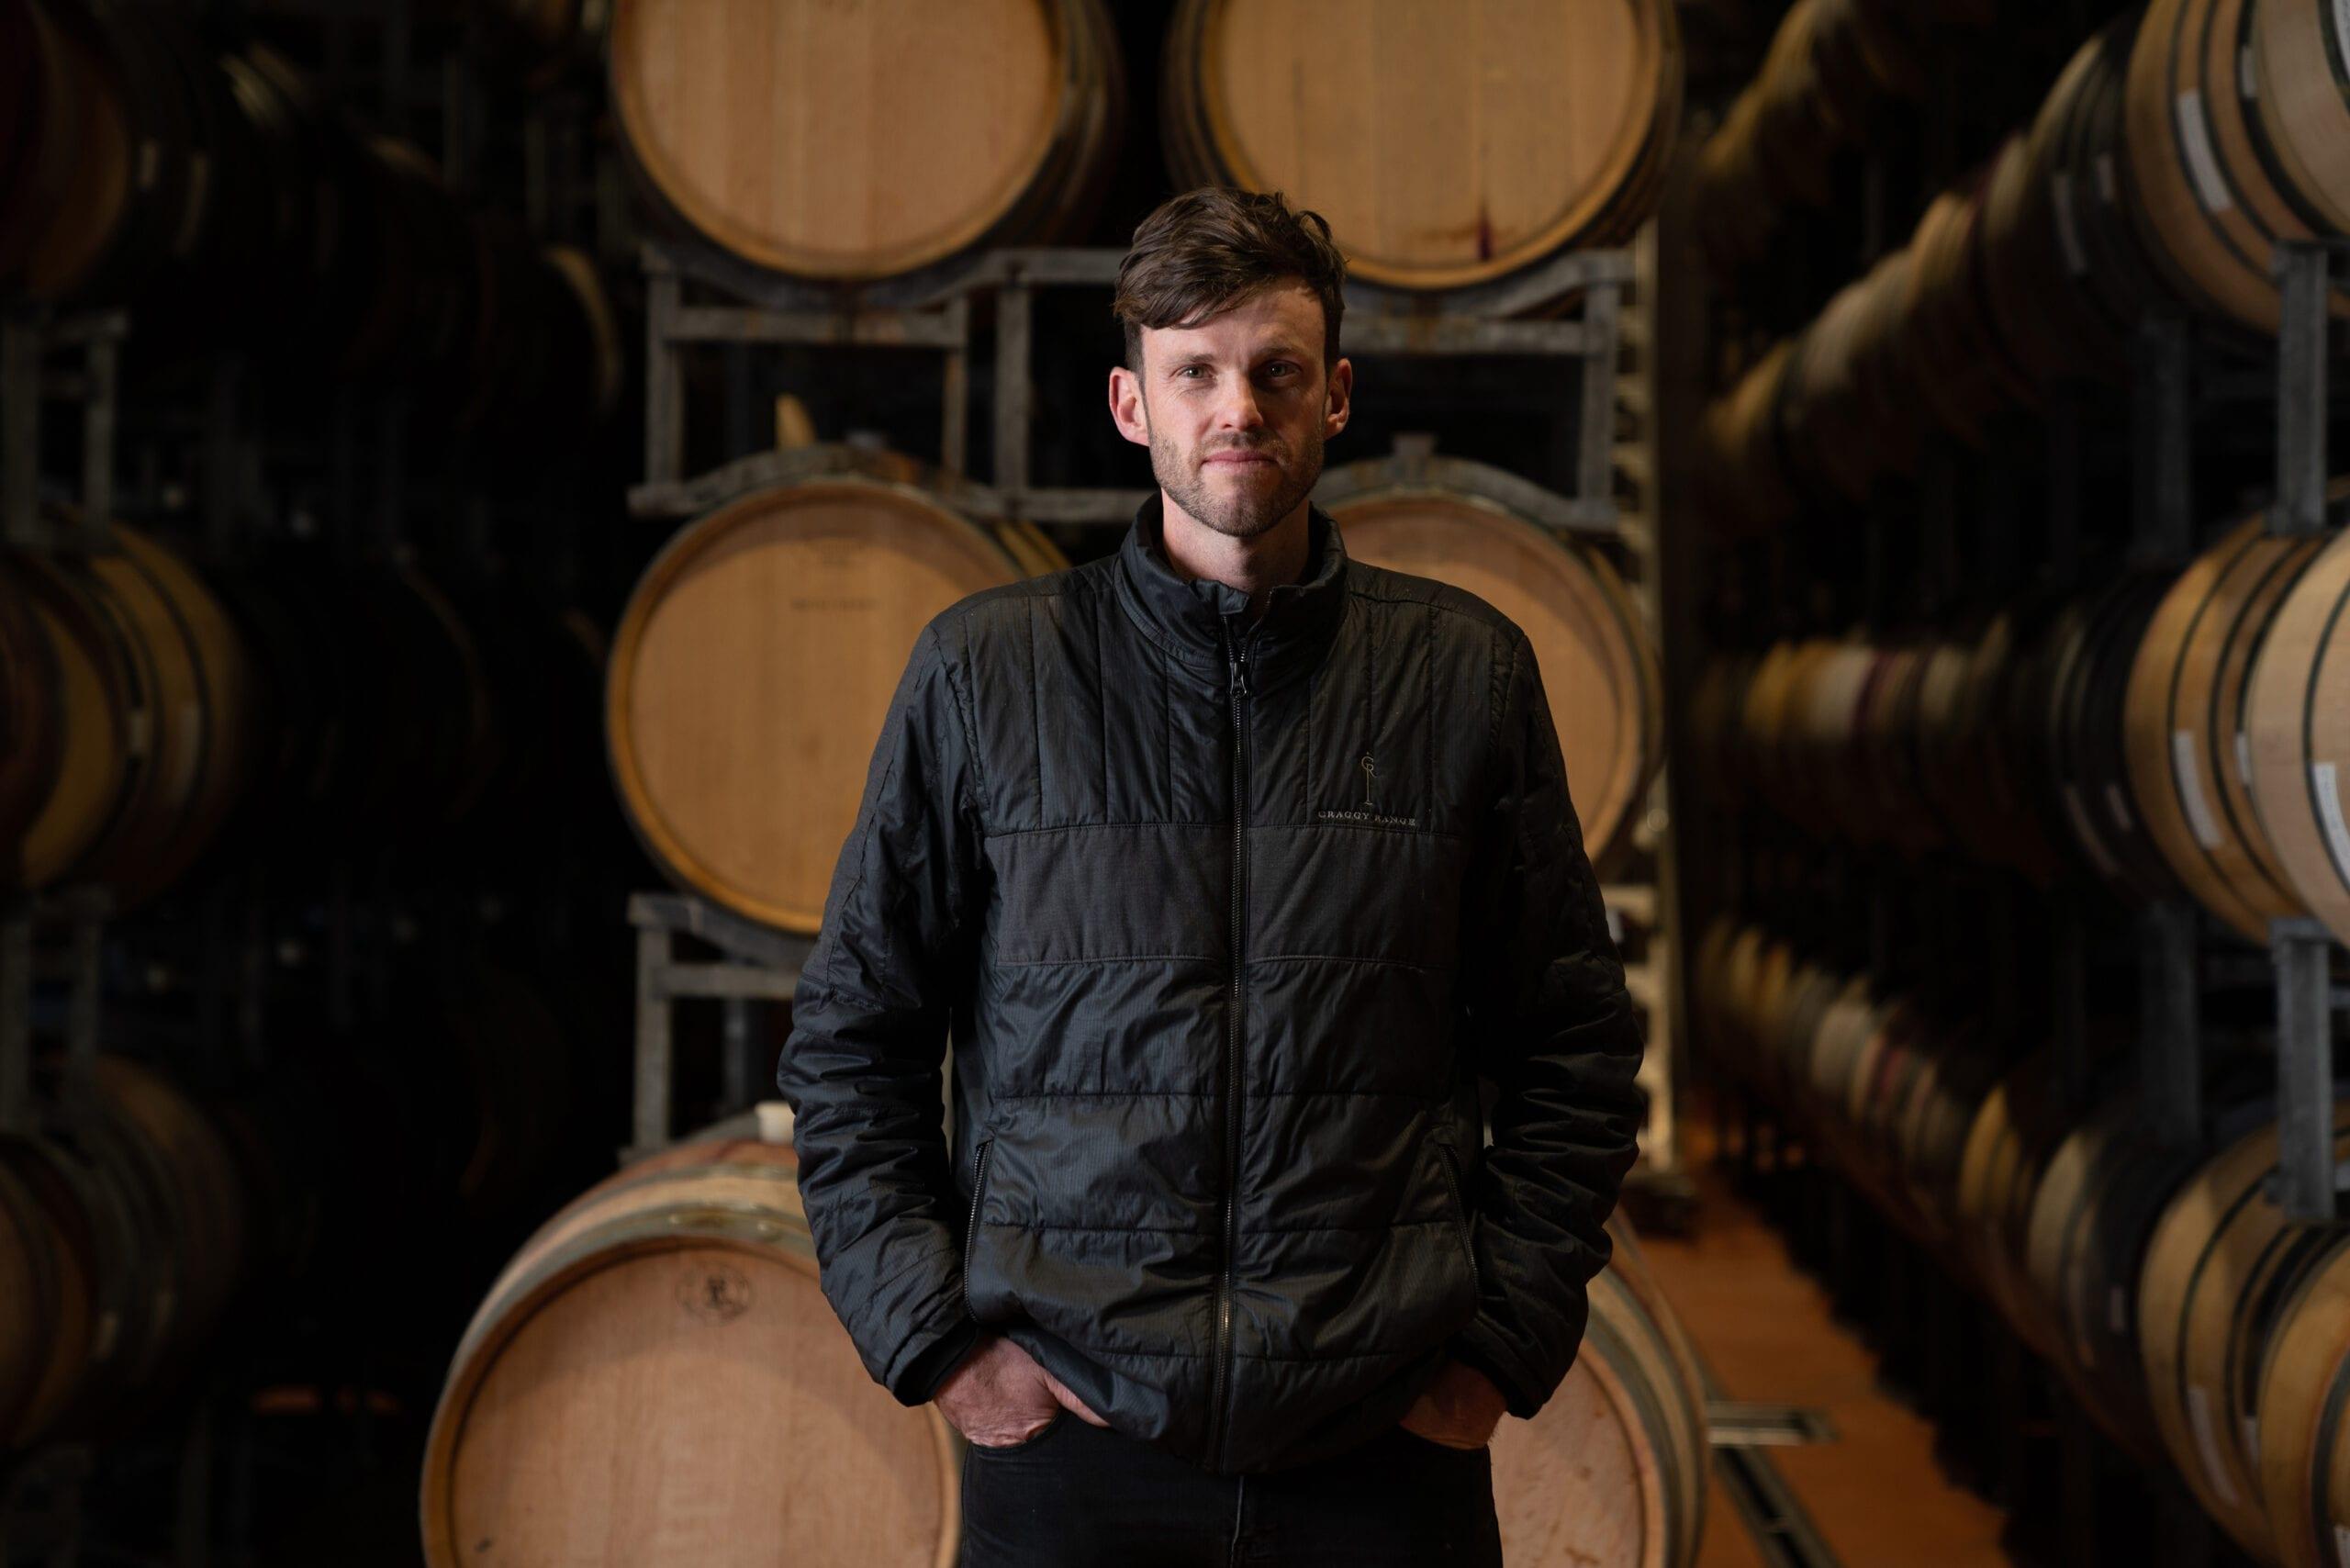 Julian Grounds, Winemaker at Craggy Range